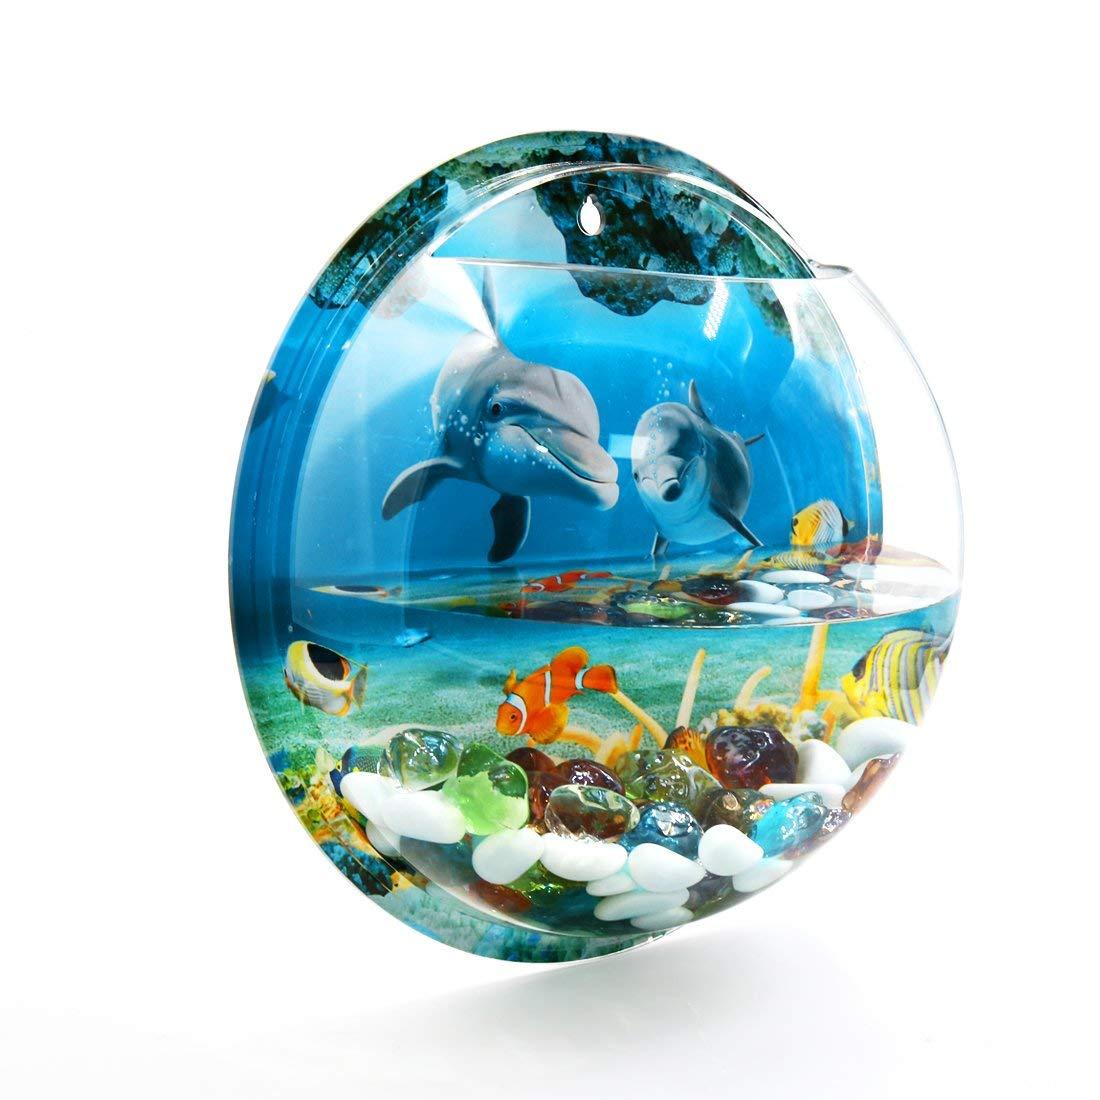 Amazon.com : ZCHXD Wall Mounted Acrylic Fishbowl Betta Tank Hanging ...